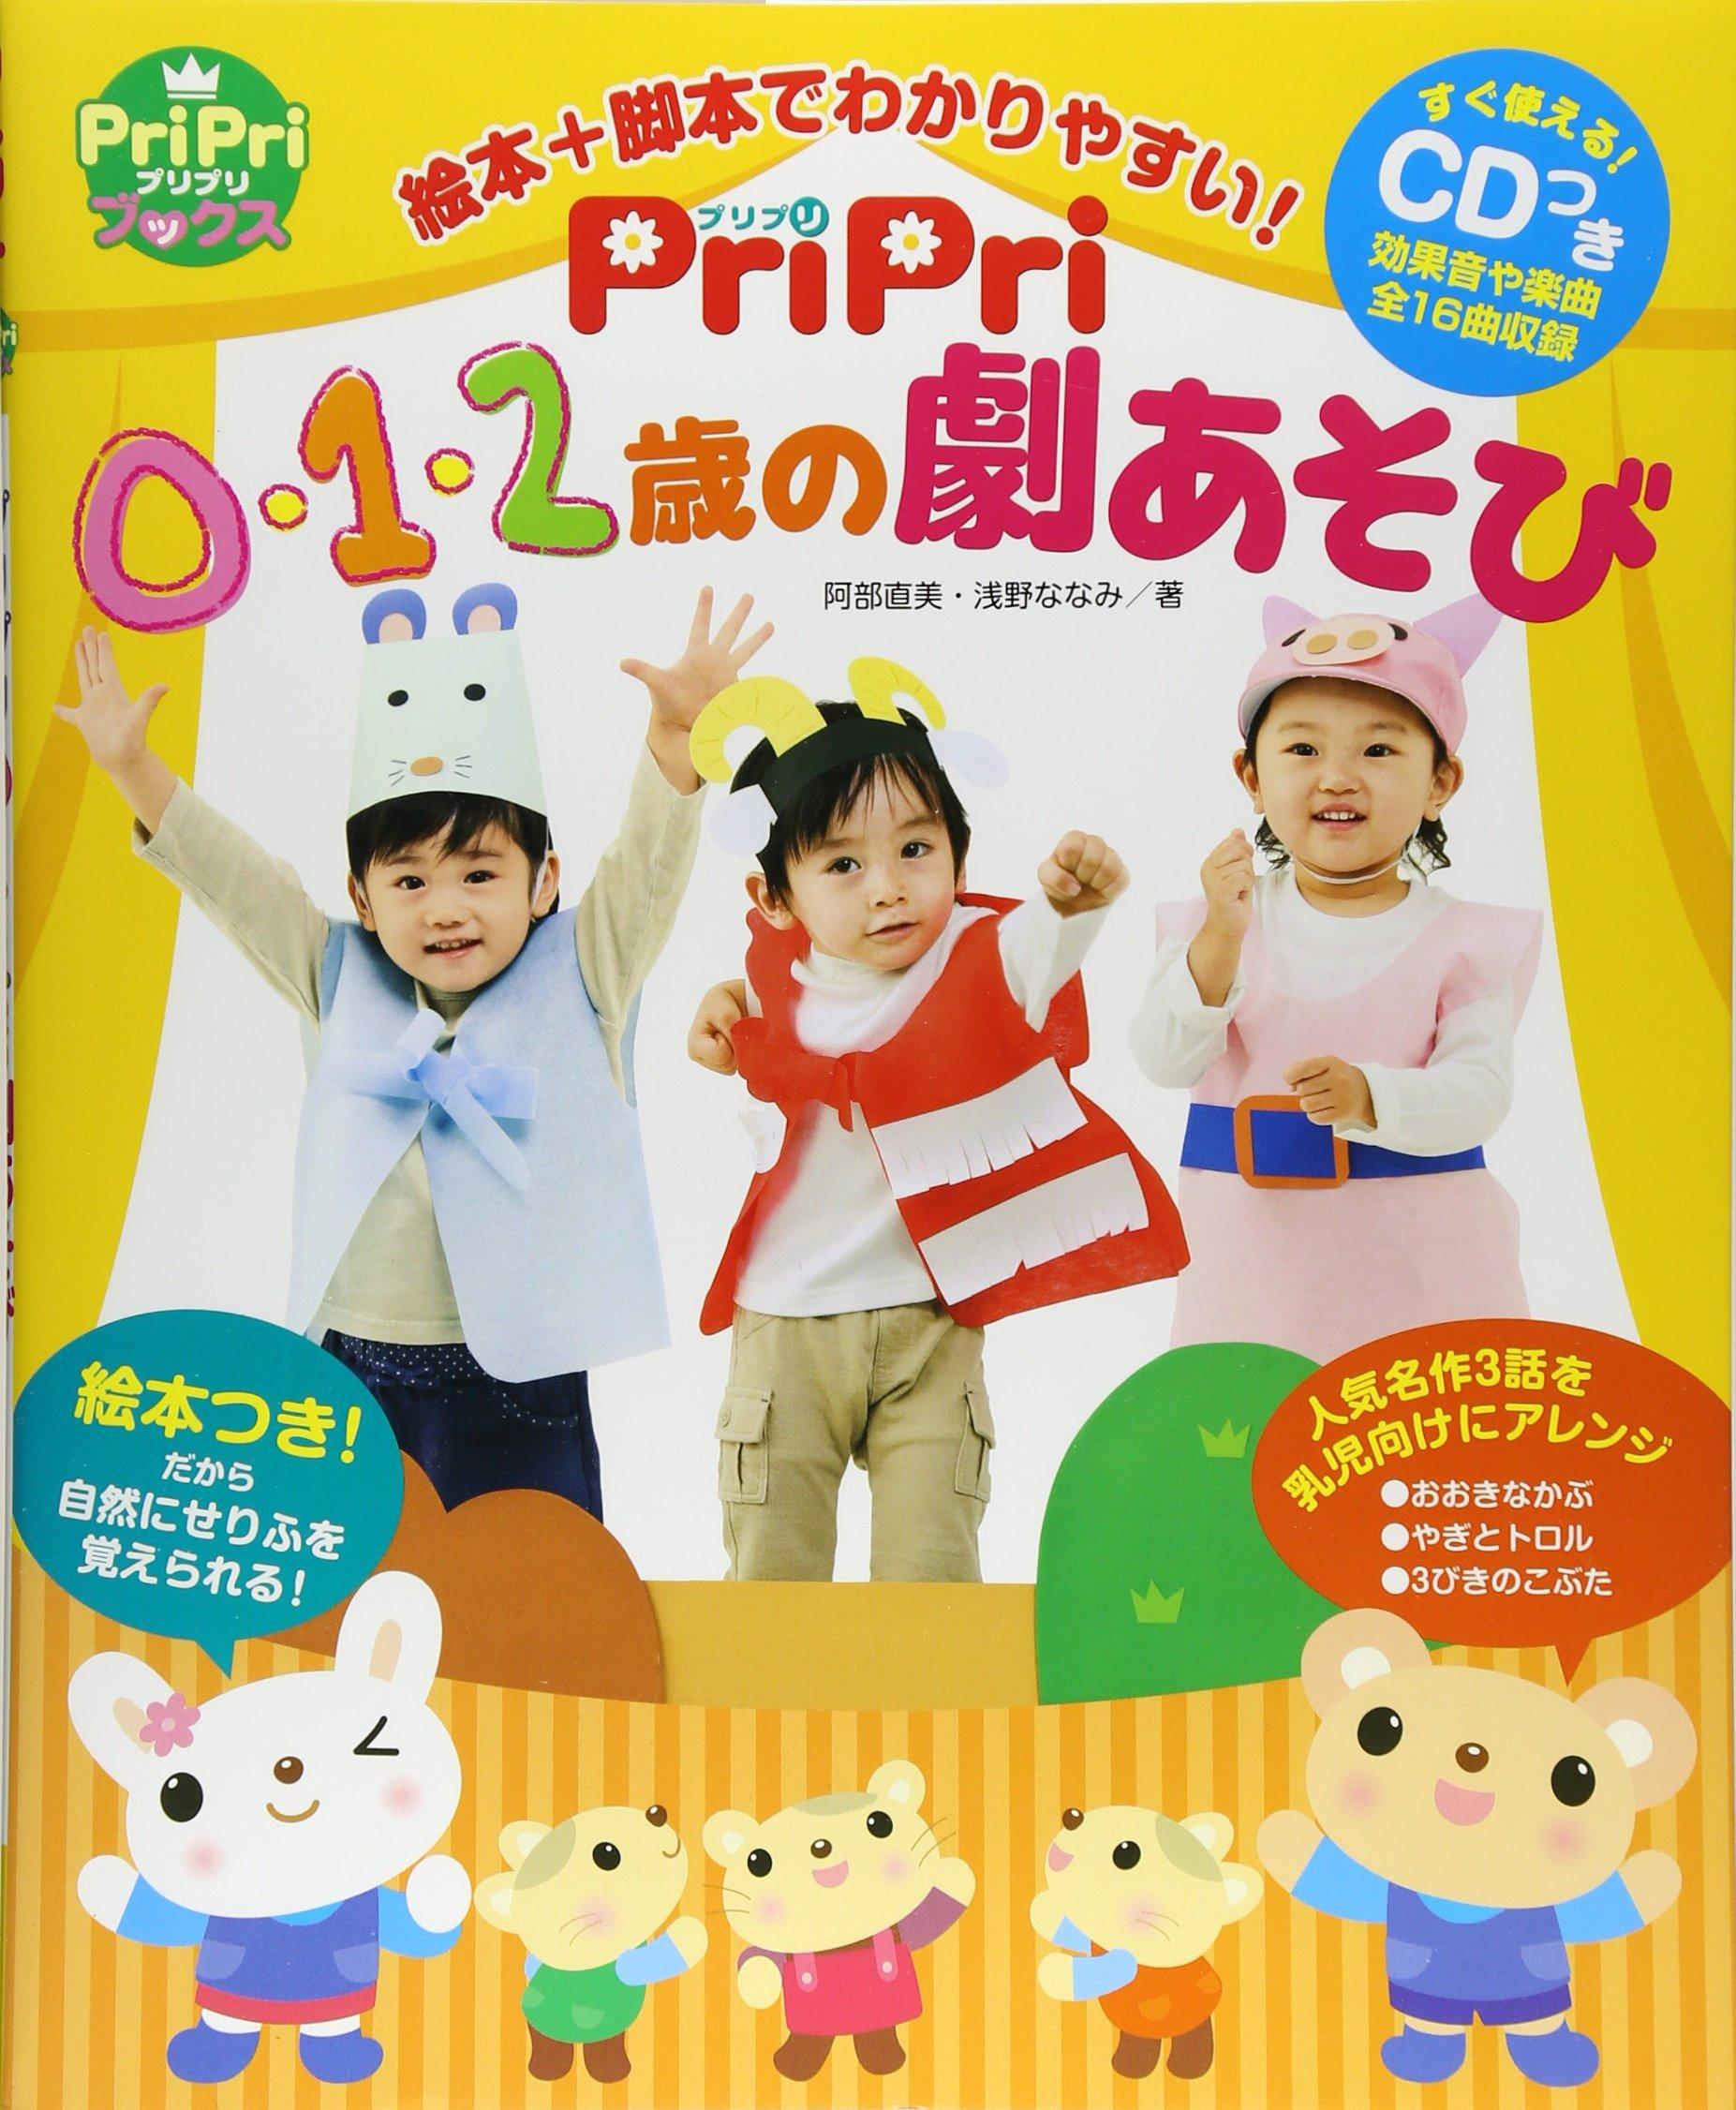 PriPri 0・1・2歳の劇あそび すぐ使える! CDつき 絵本+脚本でわかりやすい!